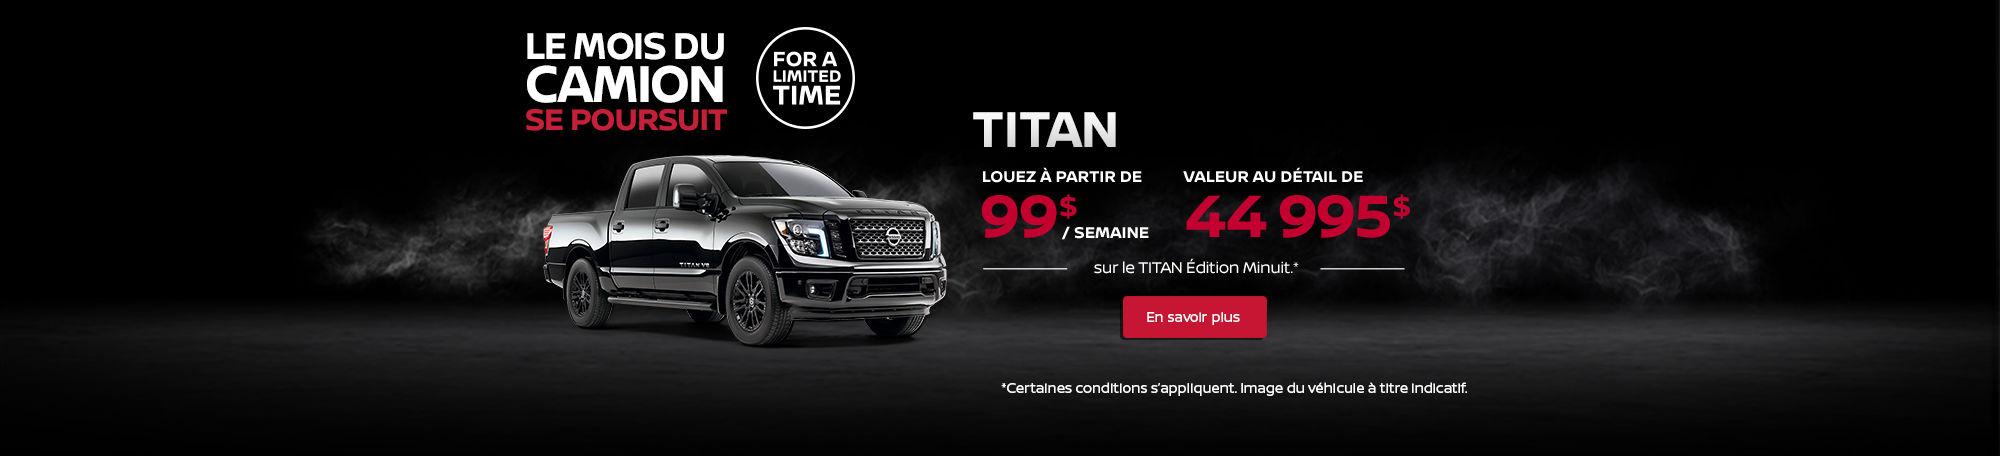 Titan 2018